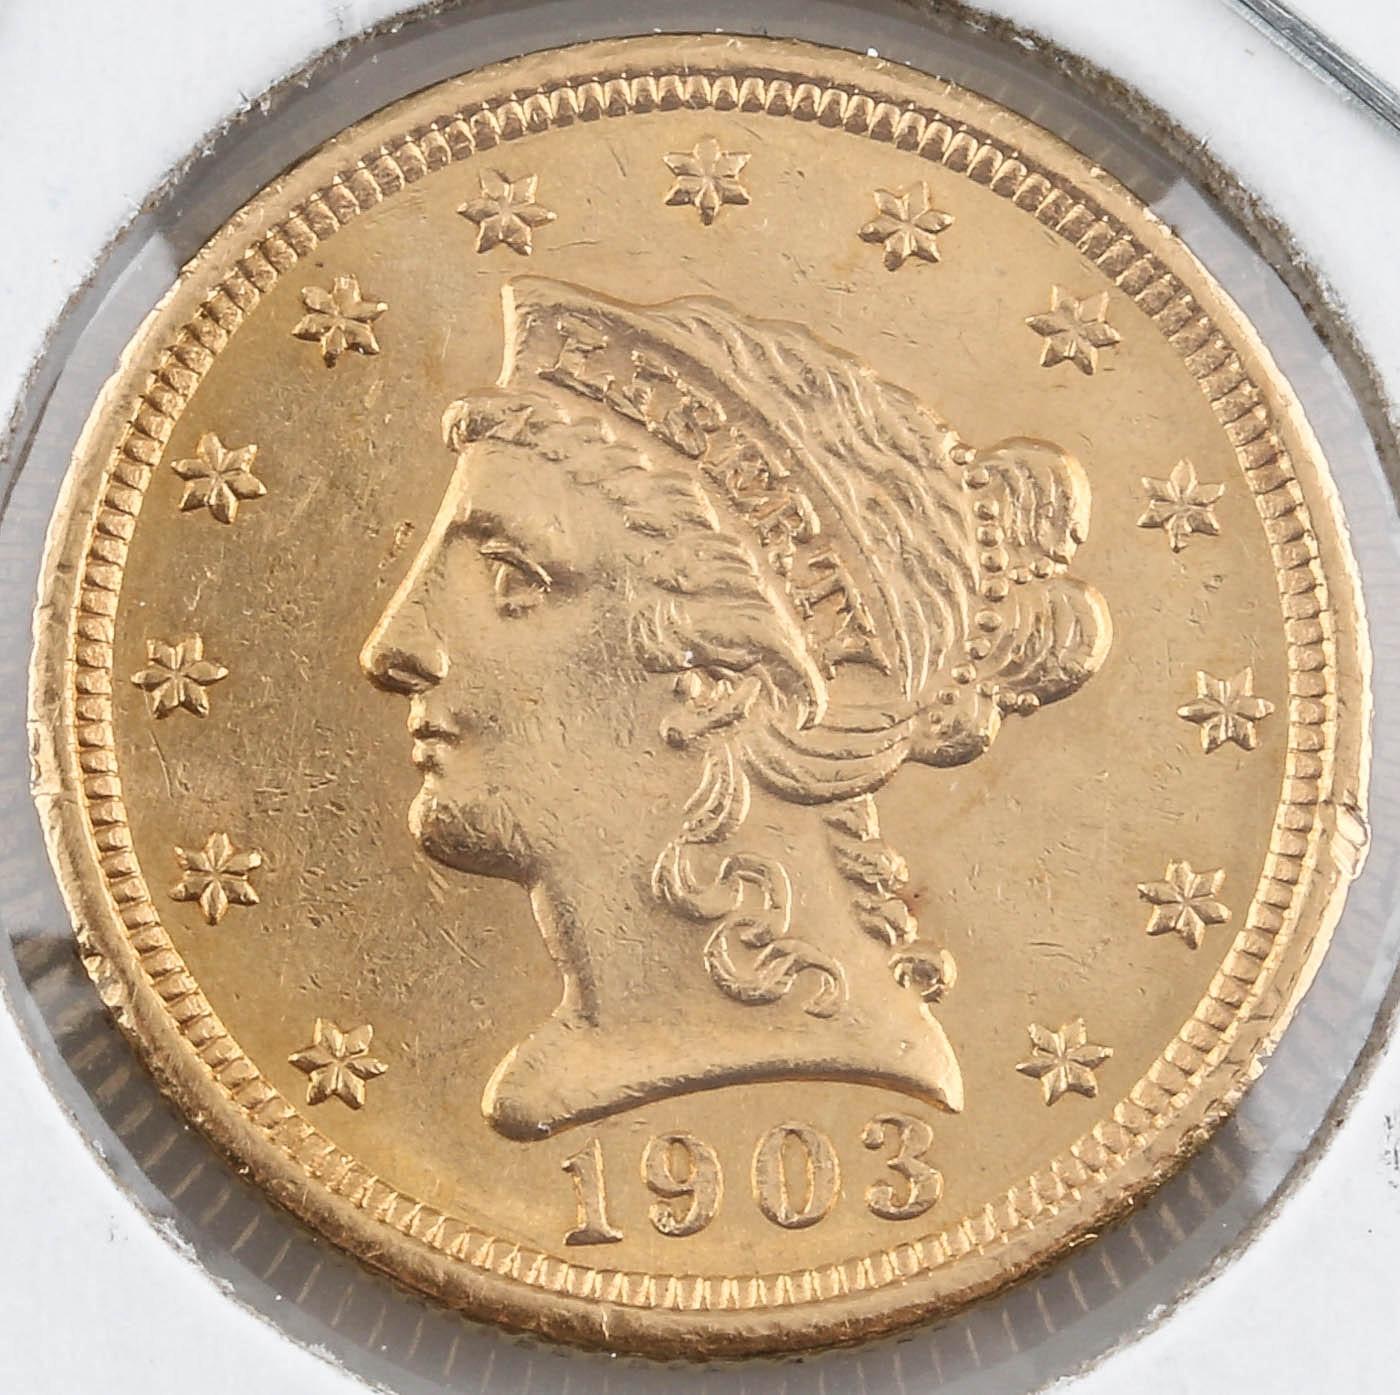 1903 Liberty Head $2 1/2 Gold Coin